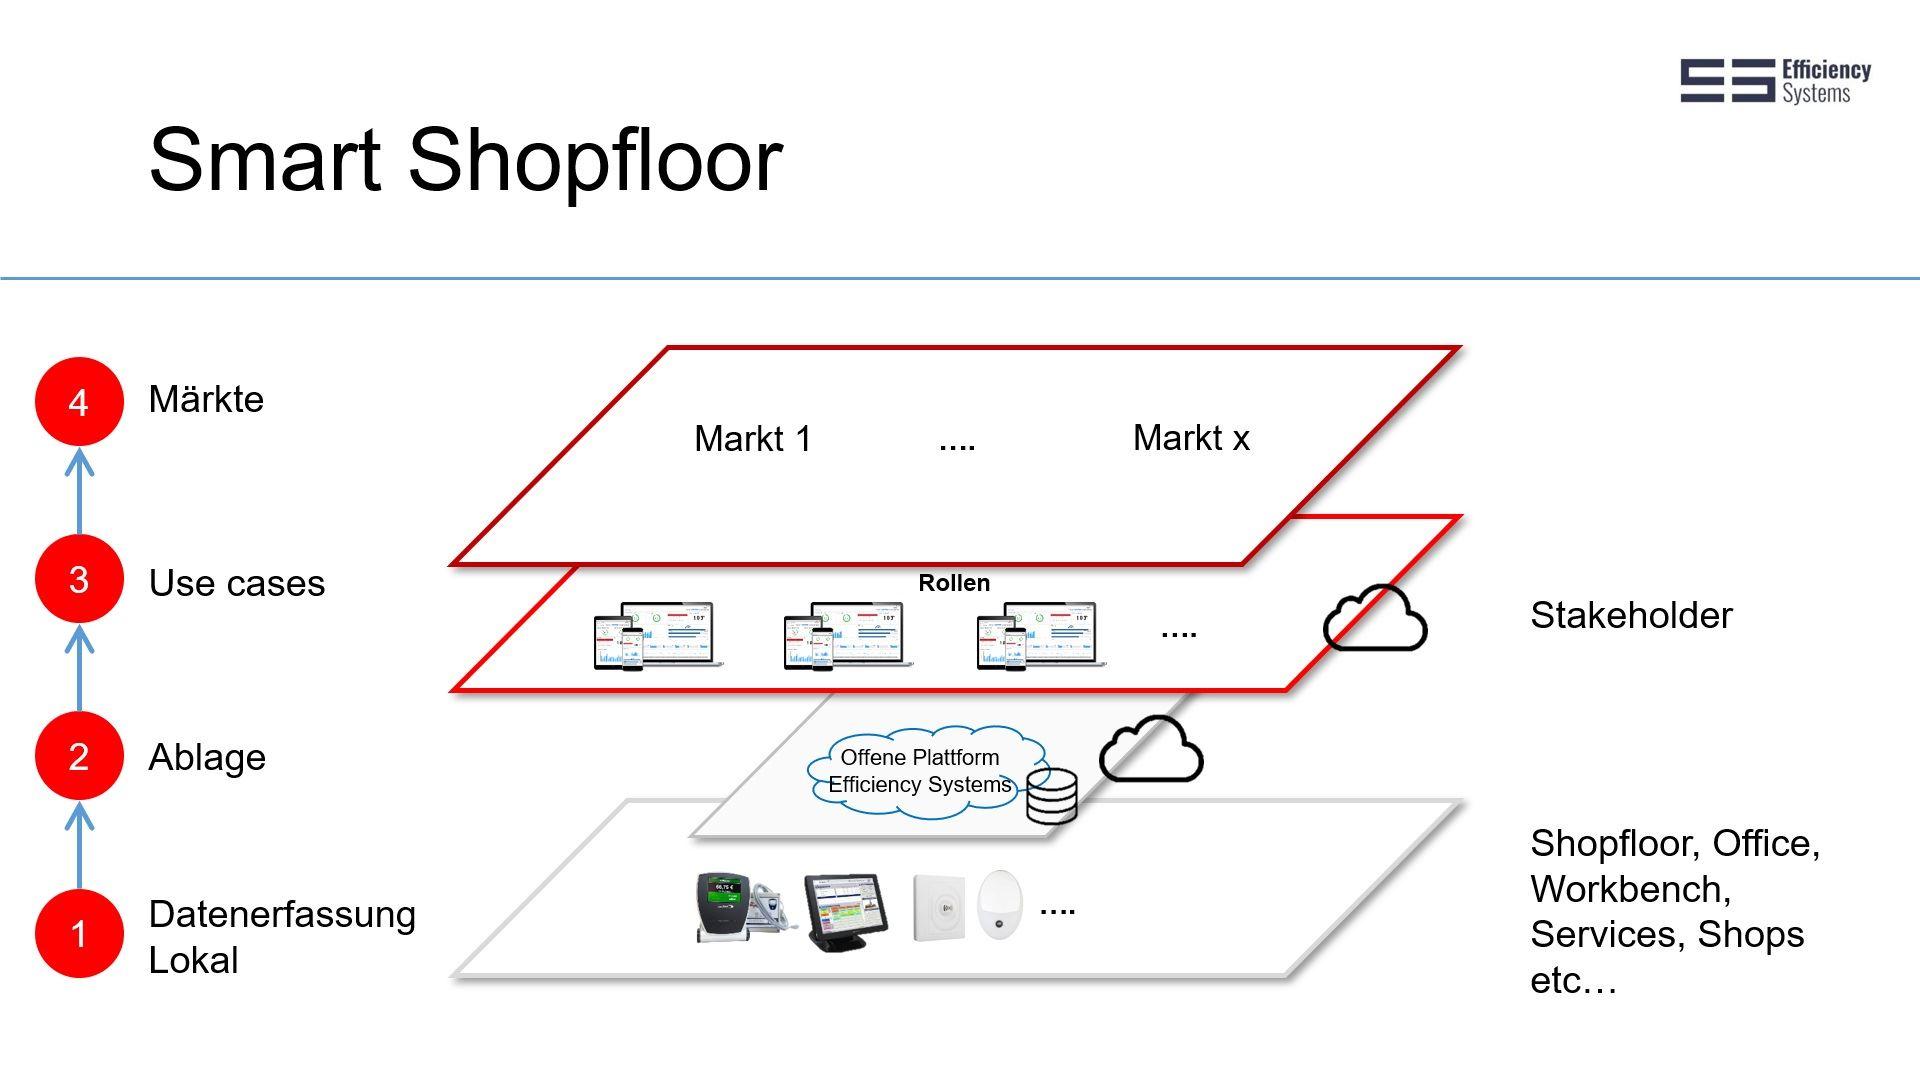 Smart Shopfloor